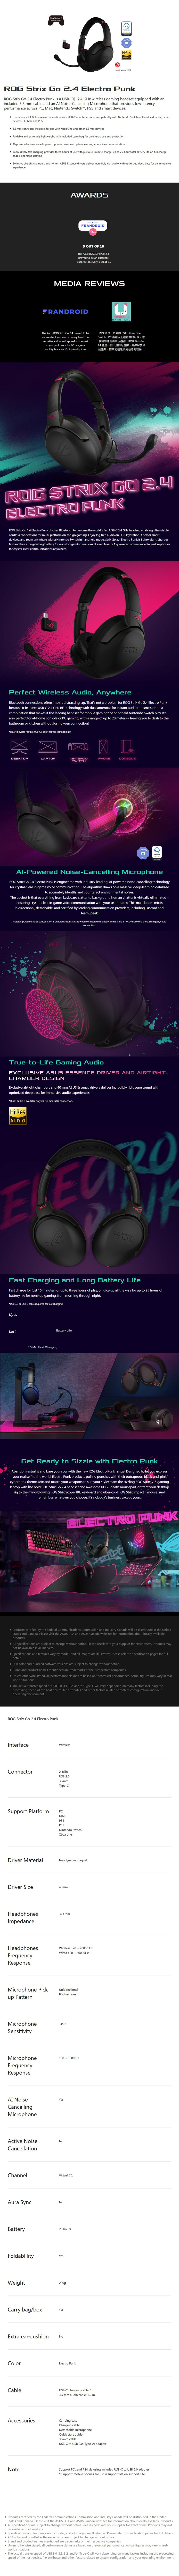 asus-rog-strix-go-24-ghz-wireless-gaming-headset-electro-punk-ac41567-4.jpg